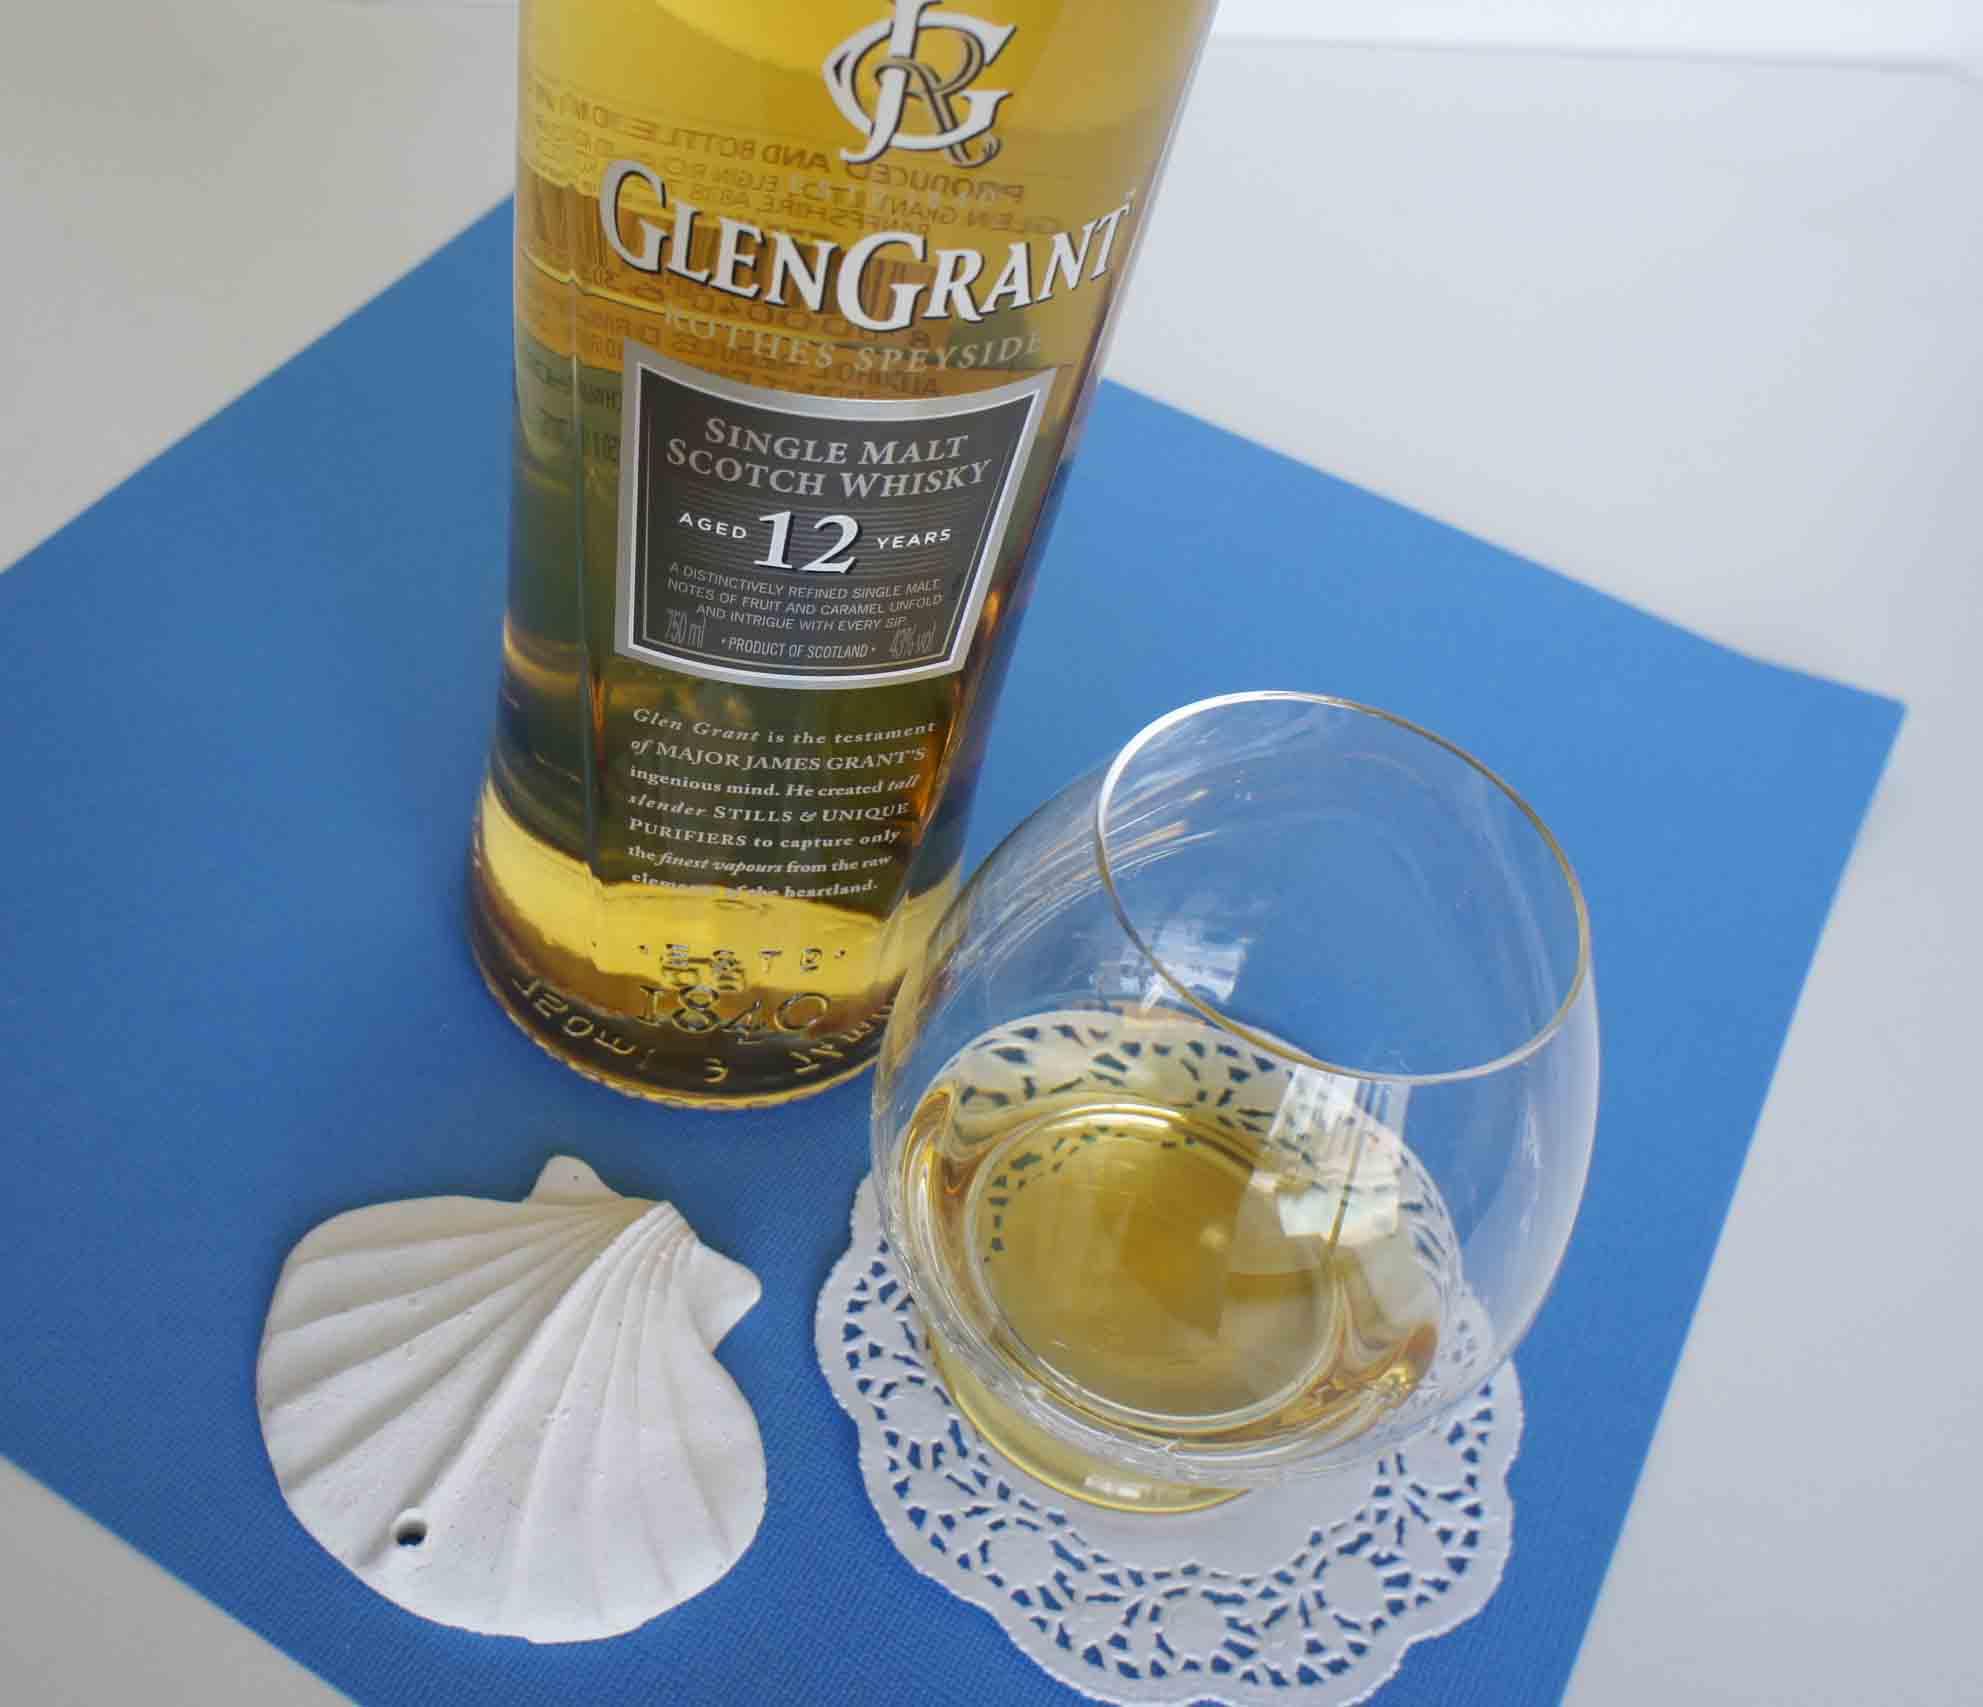 Glen Grant 12 yo whisky with glass